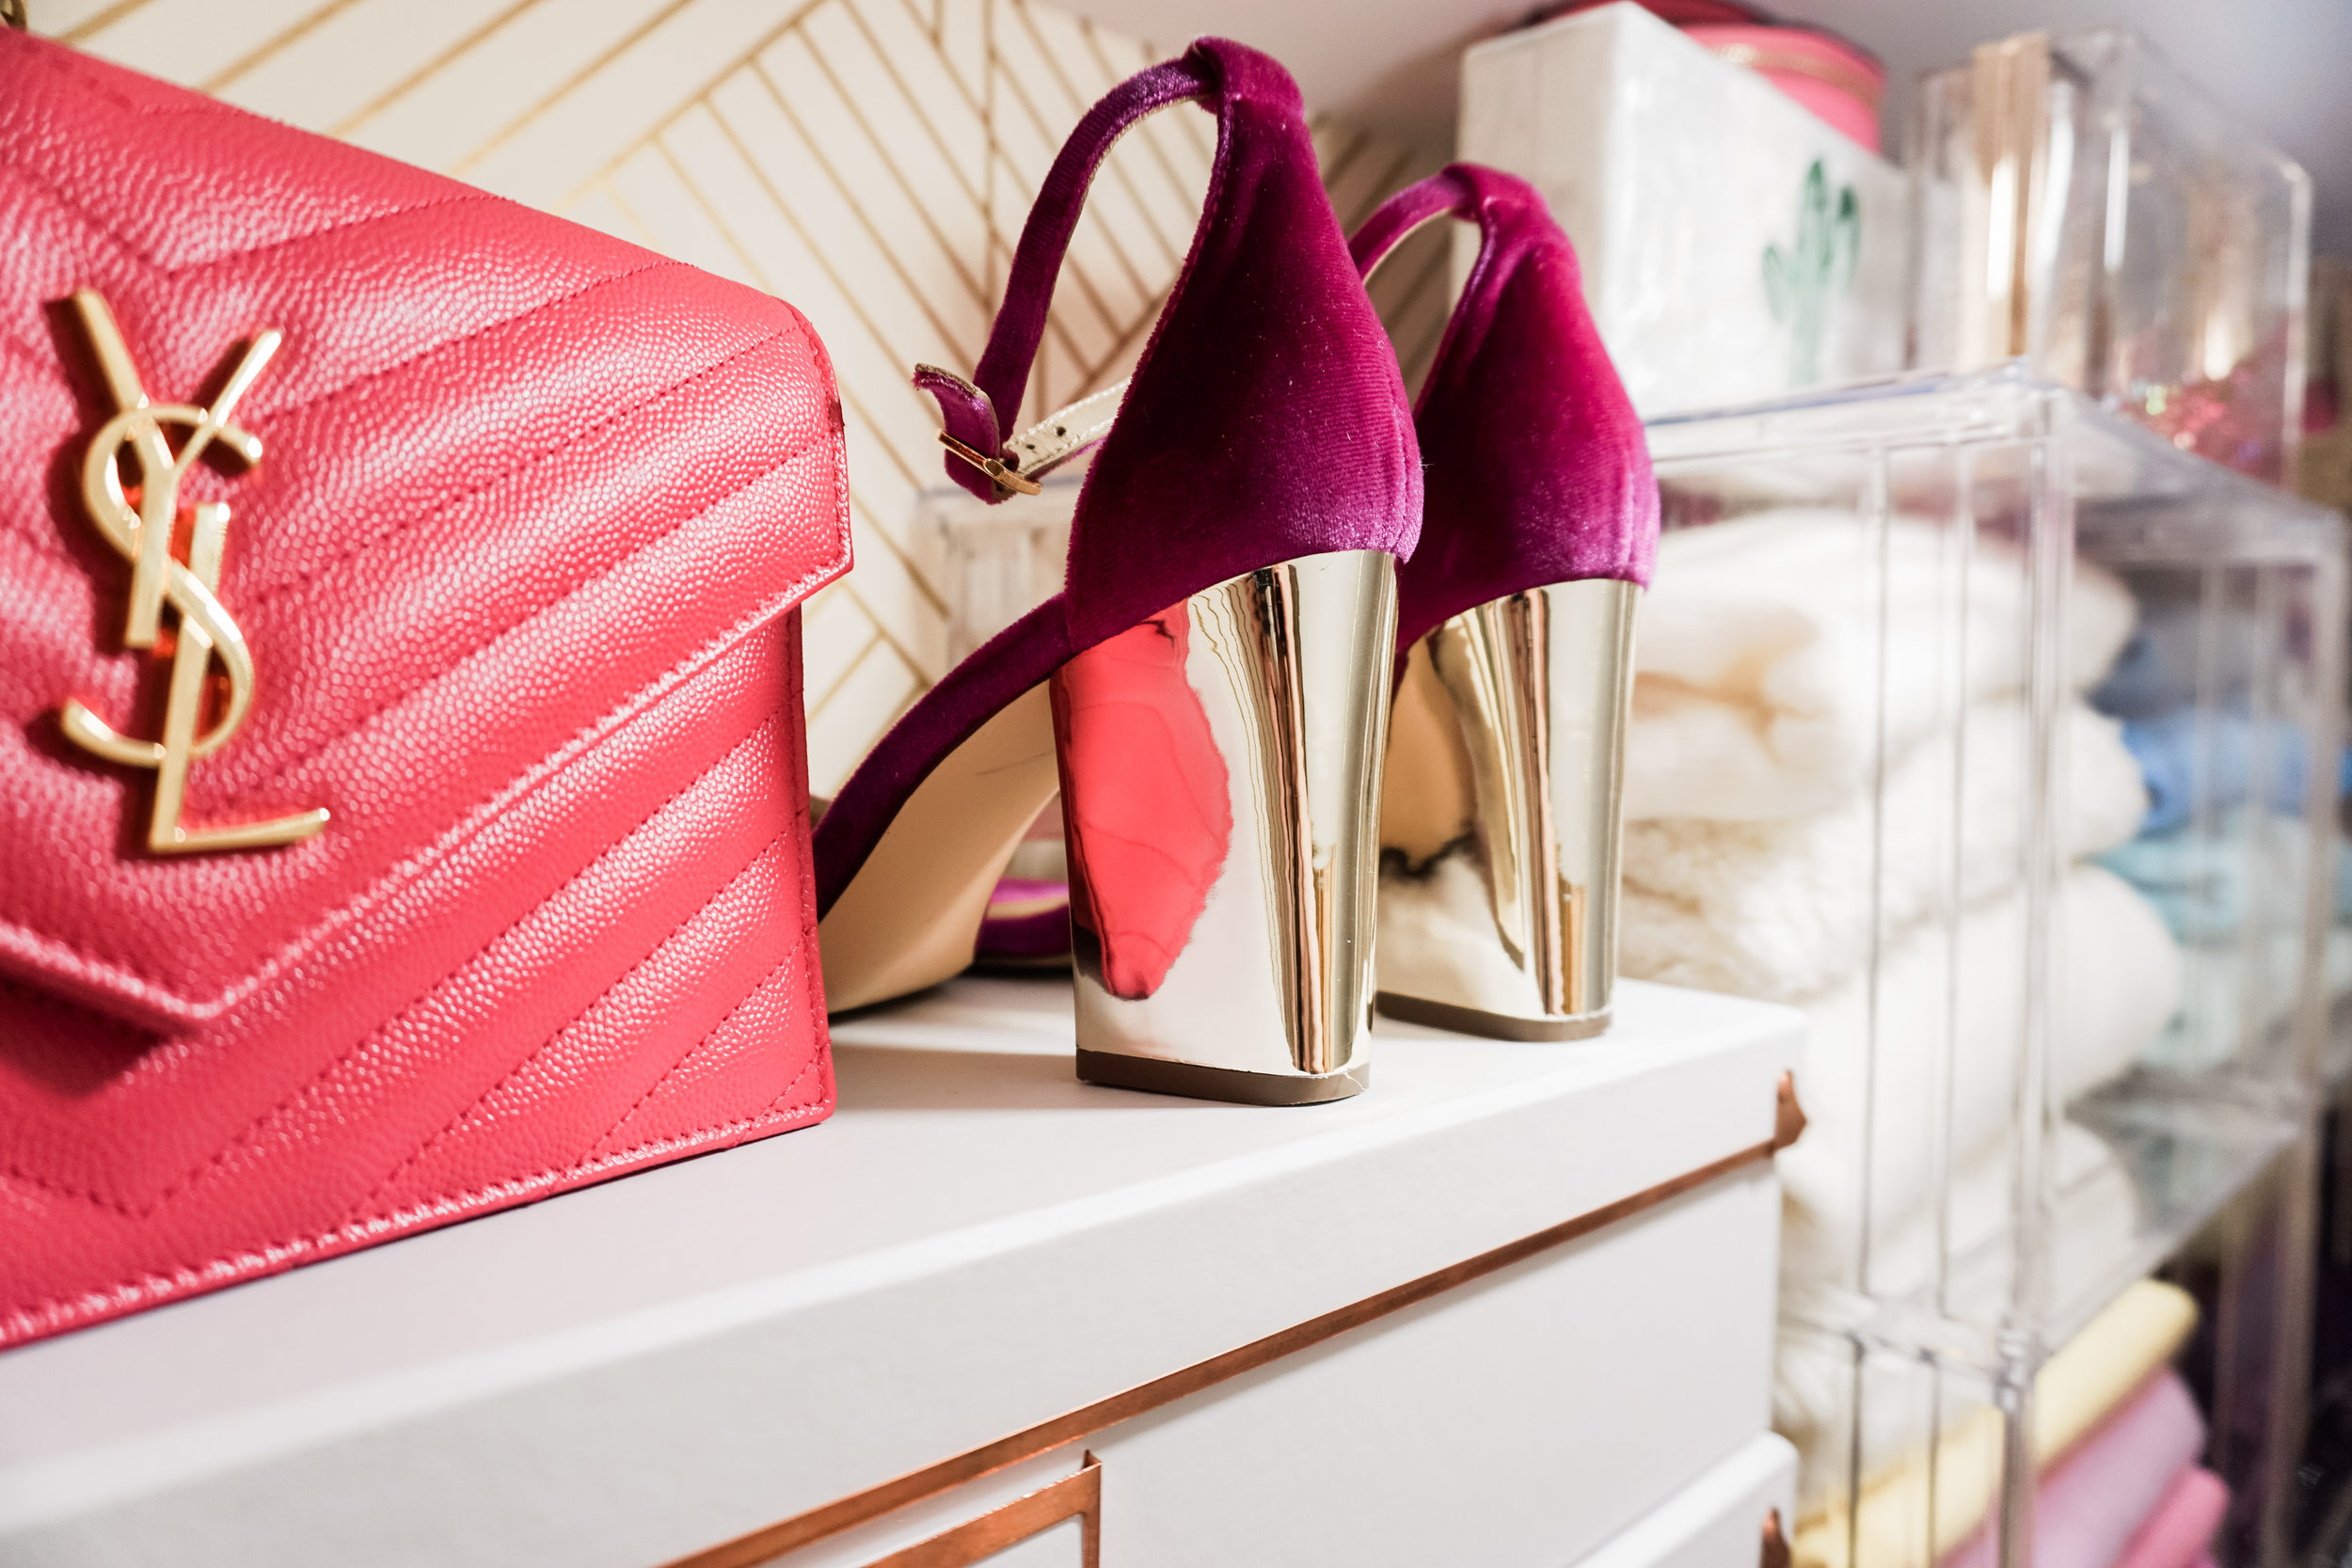 House of Turk | Closet Organization,  Shoes